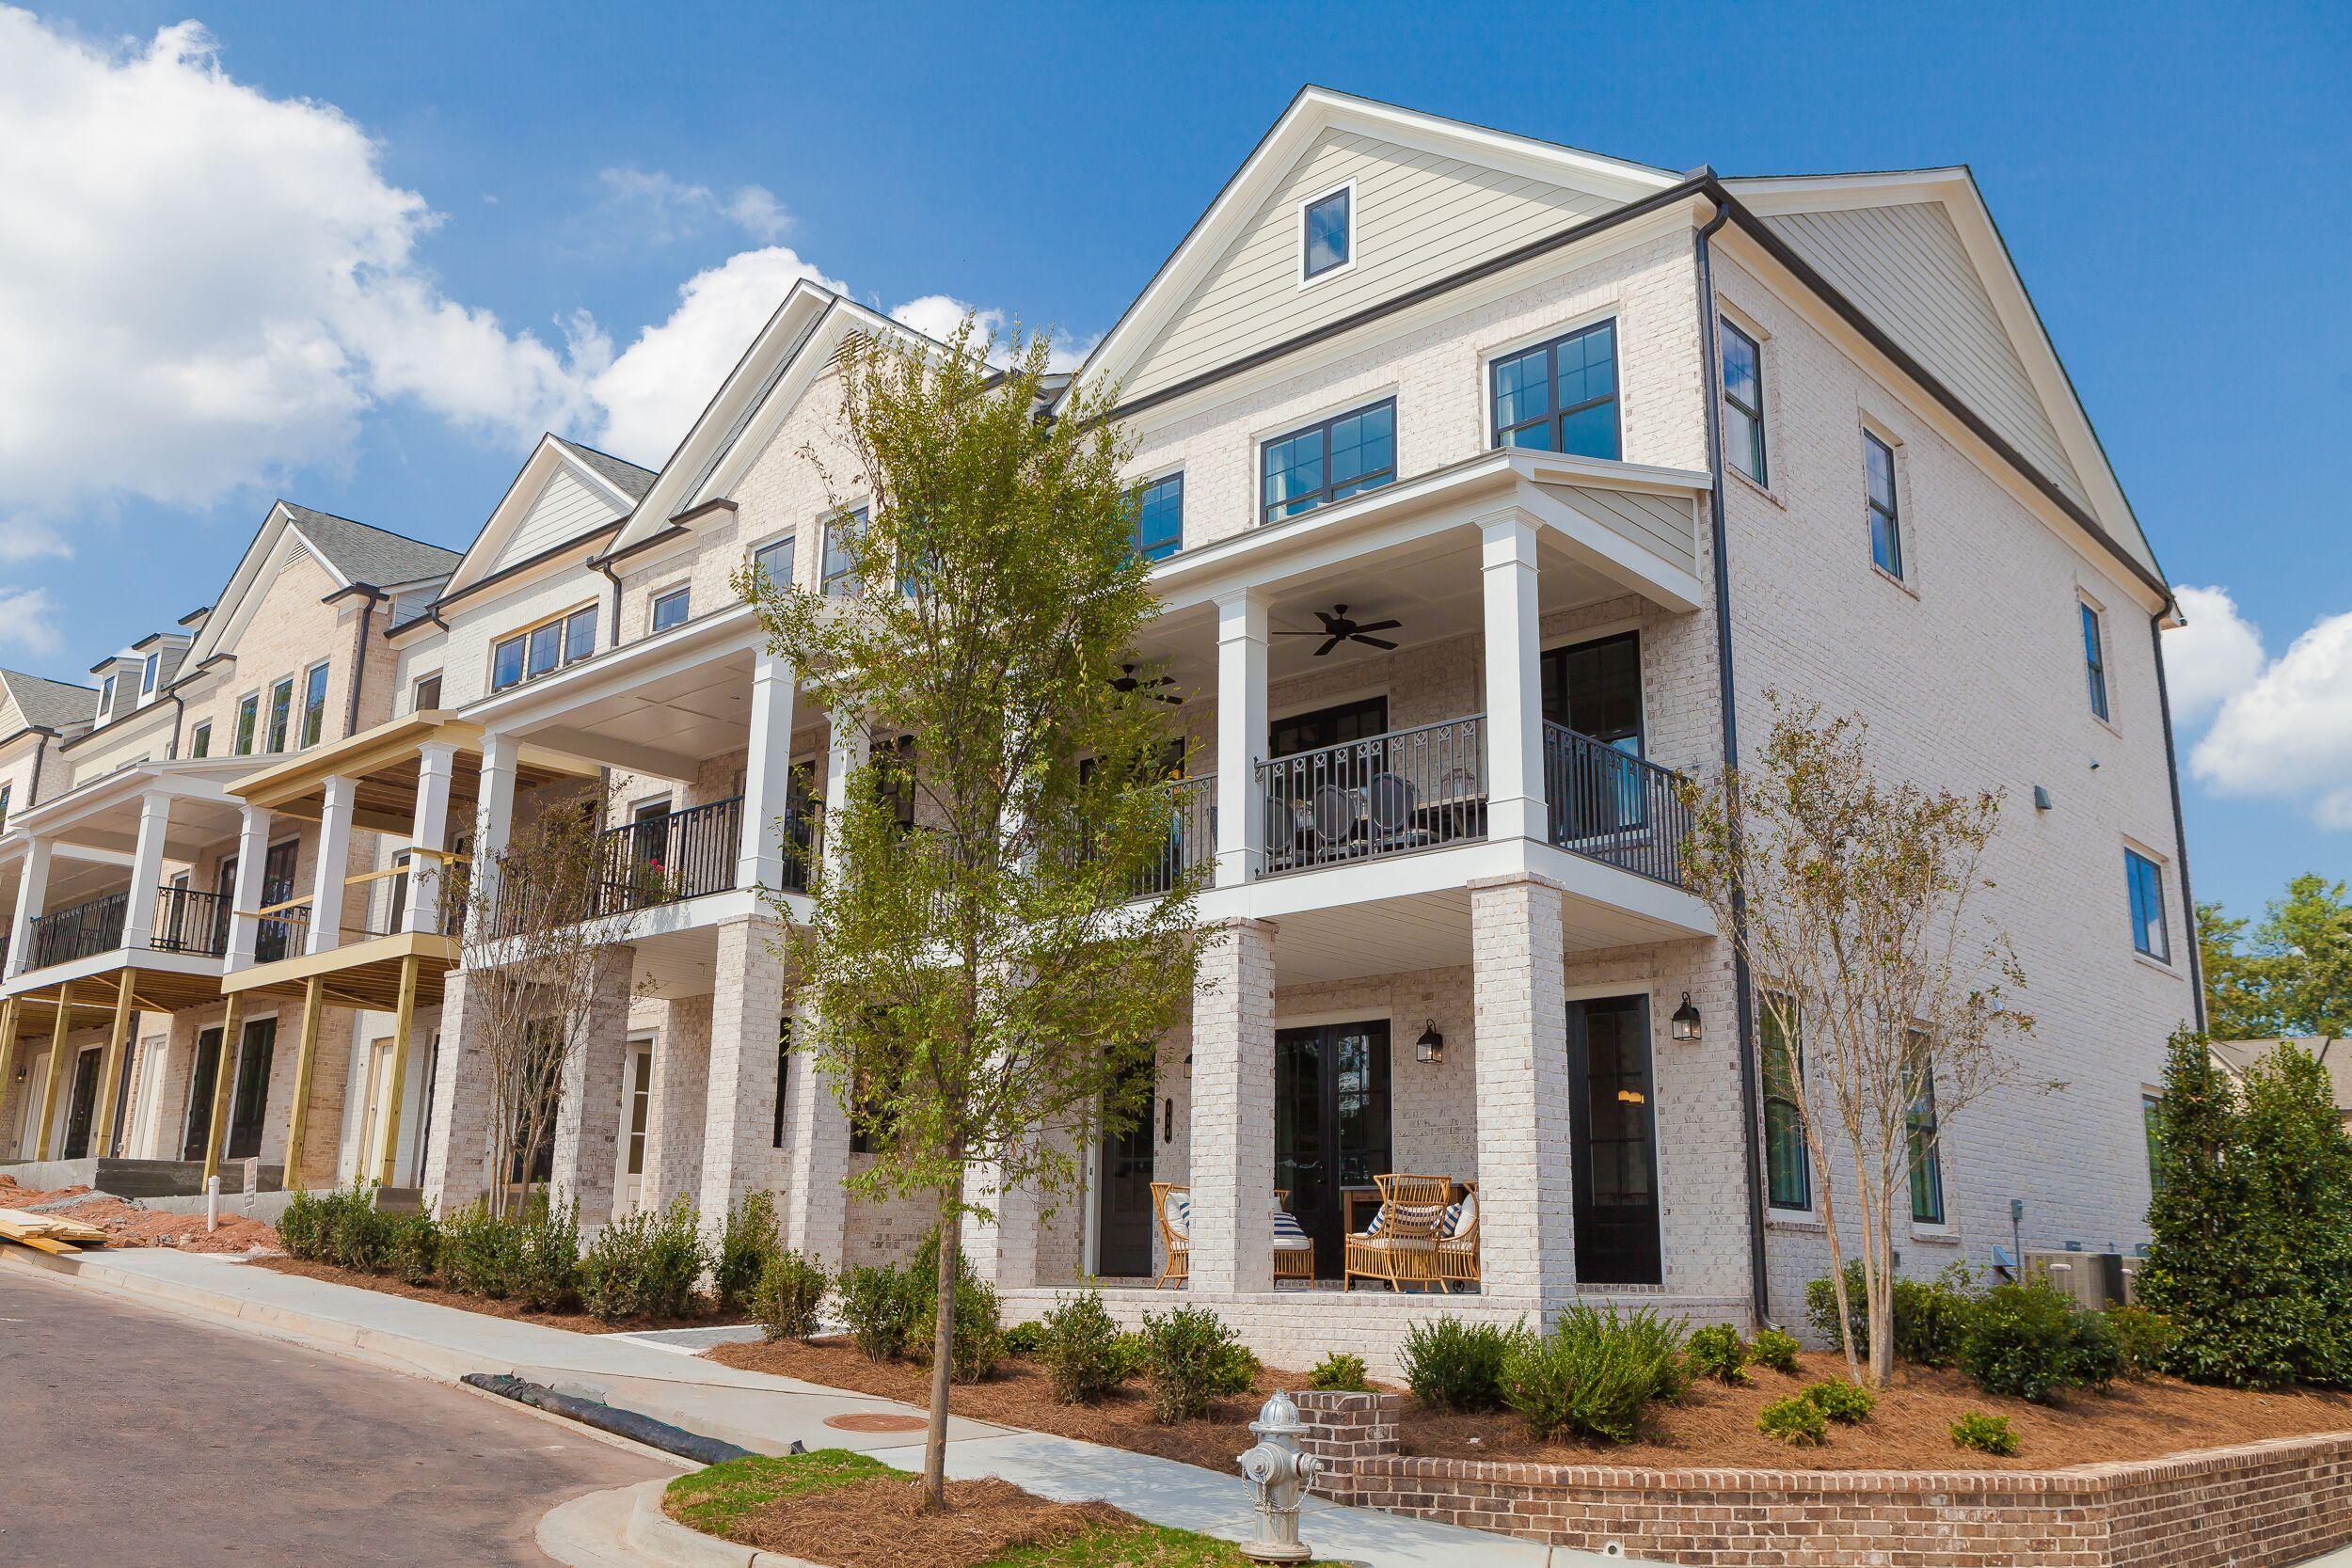 21280829 170126 Top Result 50 Lovely Brand New Homes for Sale Image 2017 Hjr2